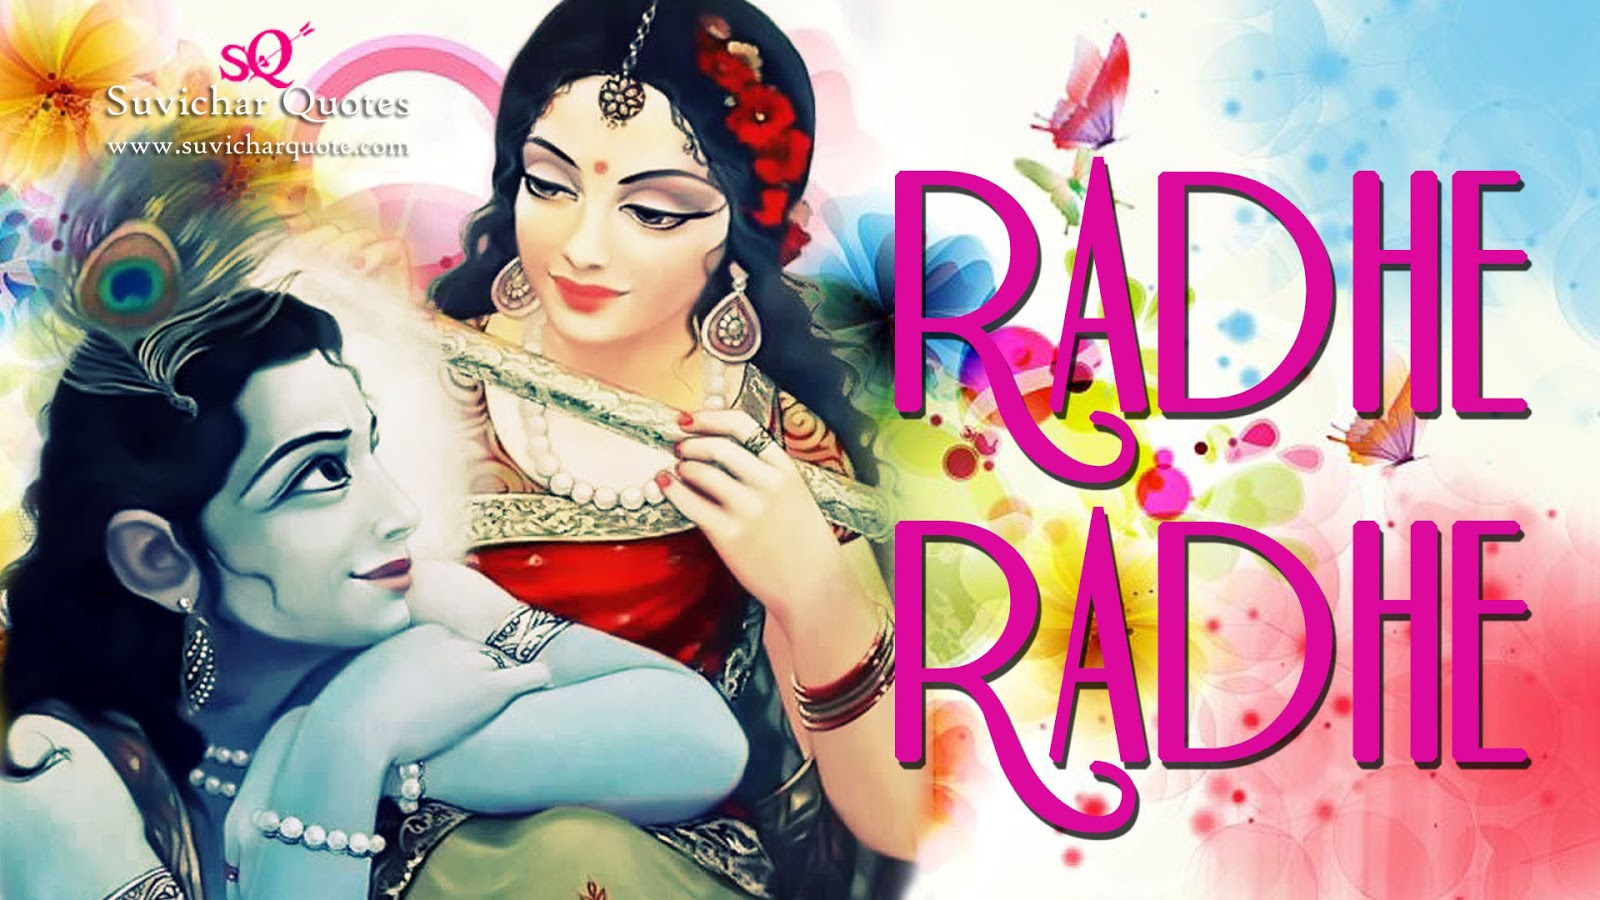 Aashima Arora Blogs Radhe Radhe Suprabhat Hindi Message Thoughts